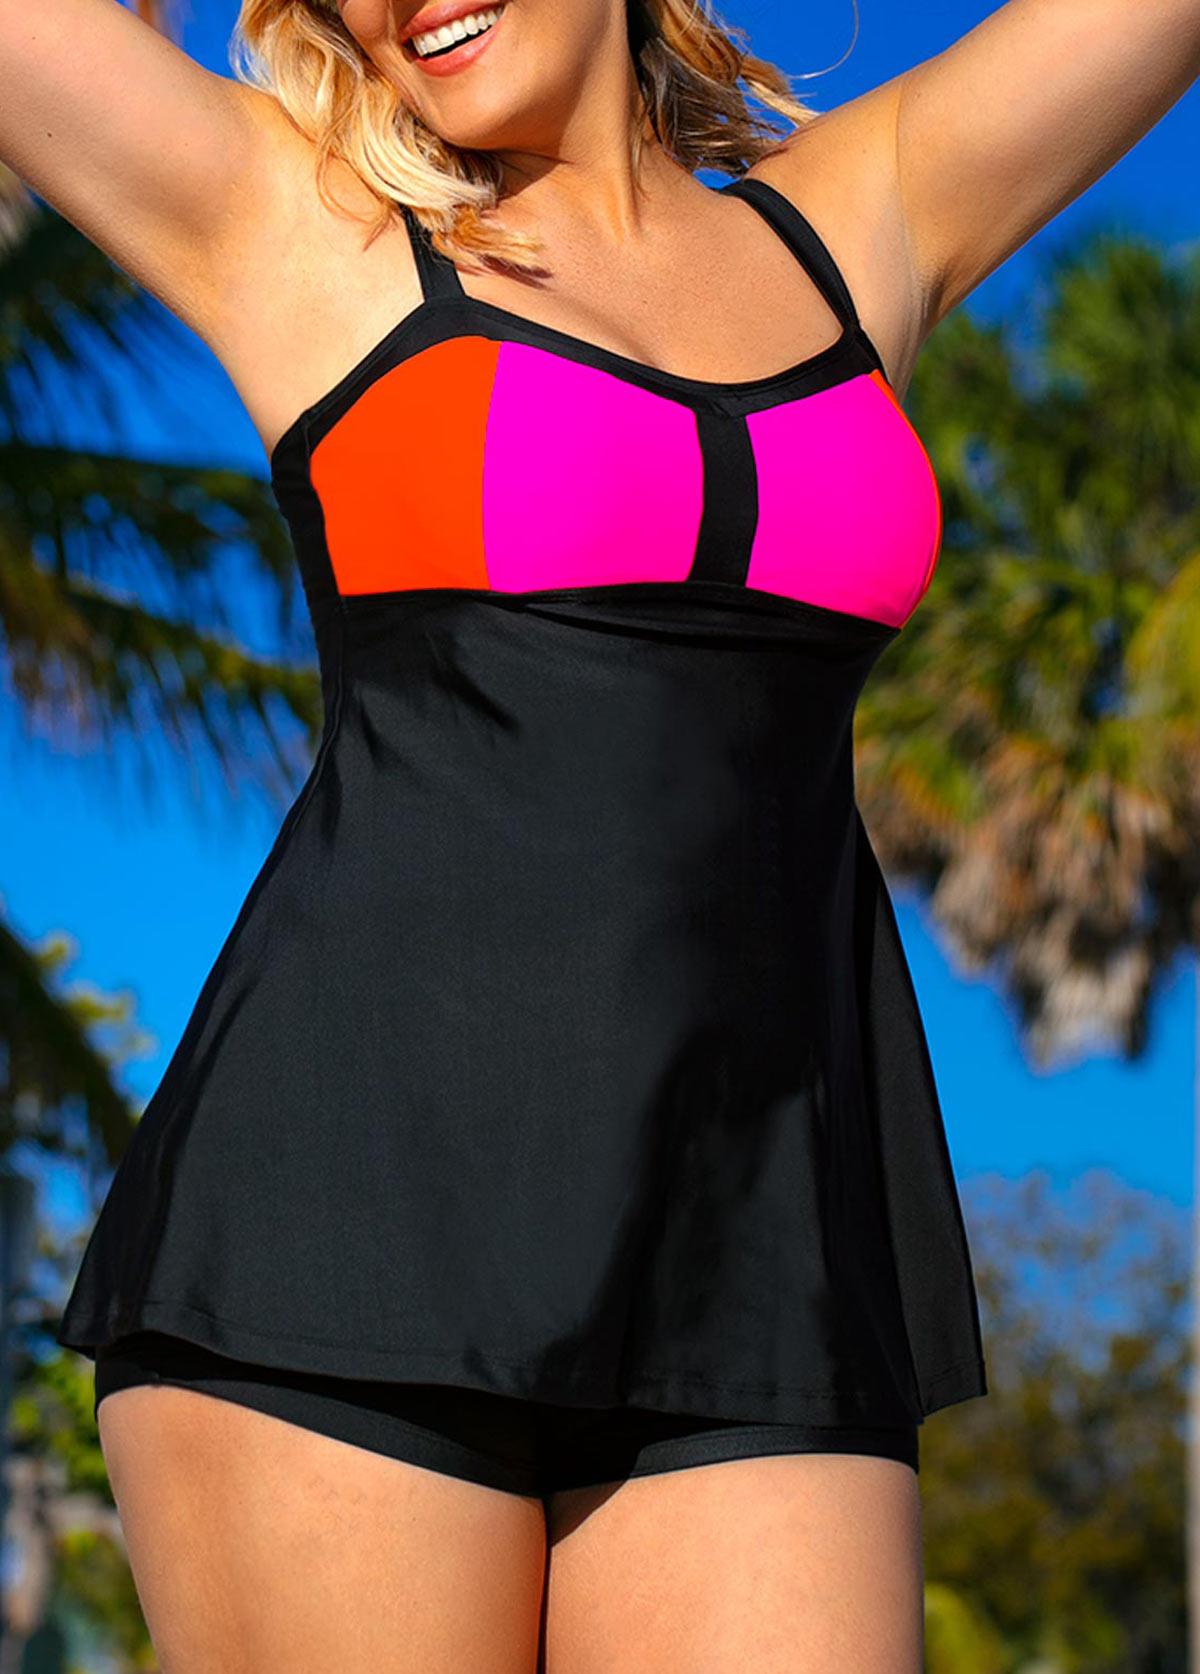 Plus Size Spaghetti Strap Swimdress And Black Shorts Modlily Com Usd 25 03